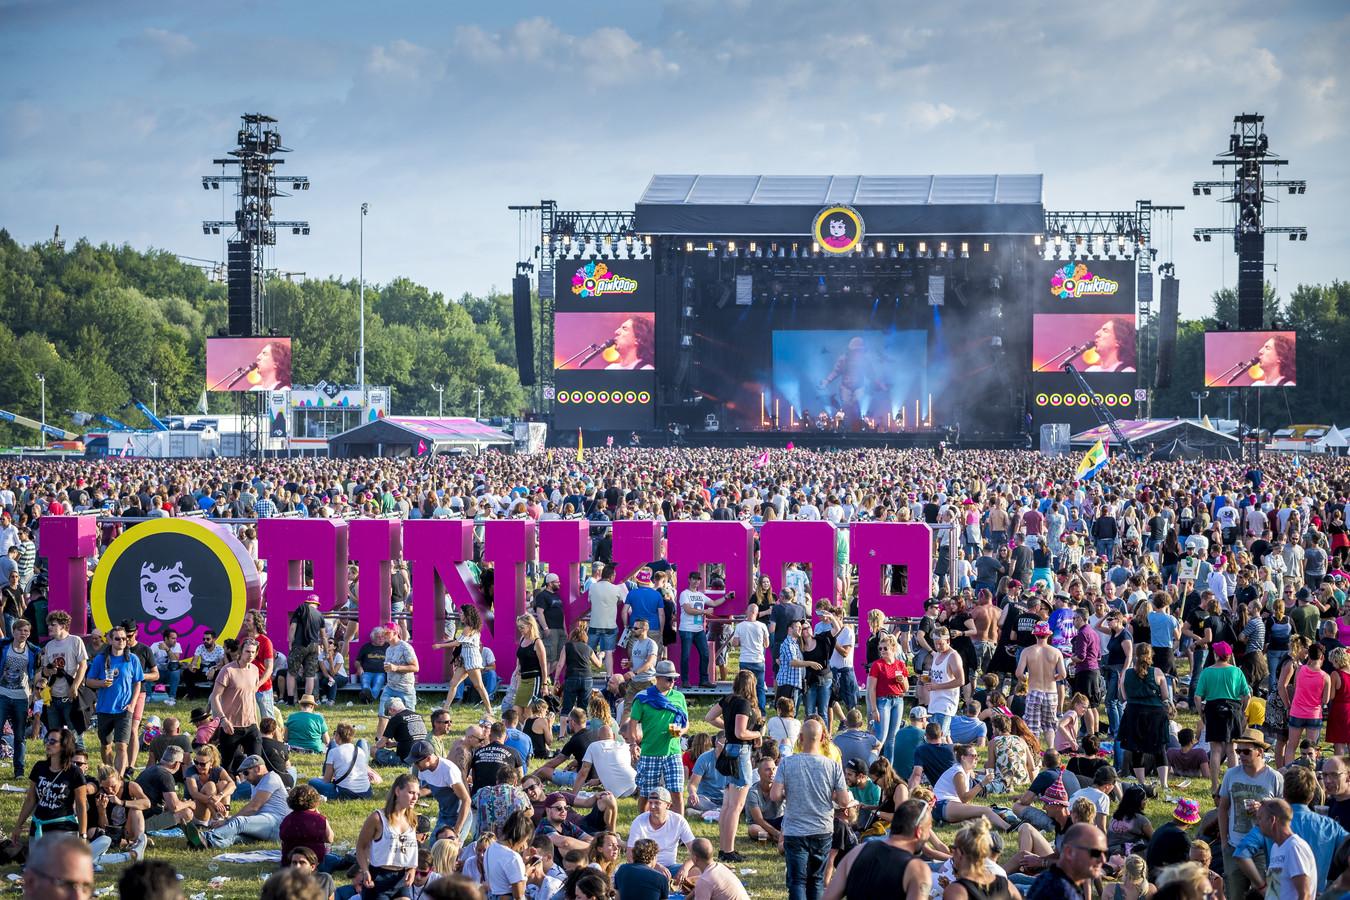 Le festival Pinkpop